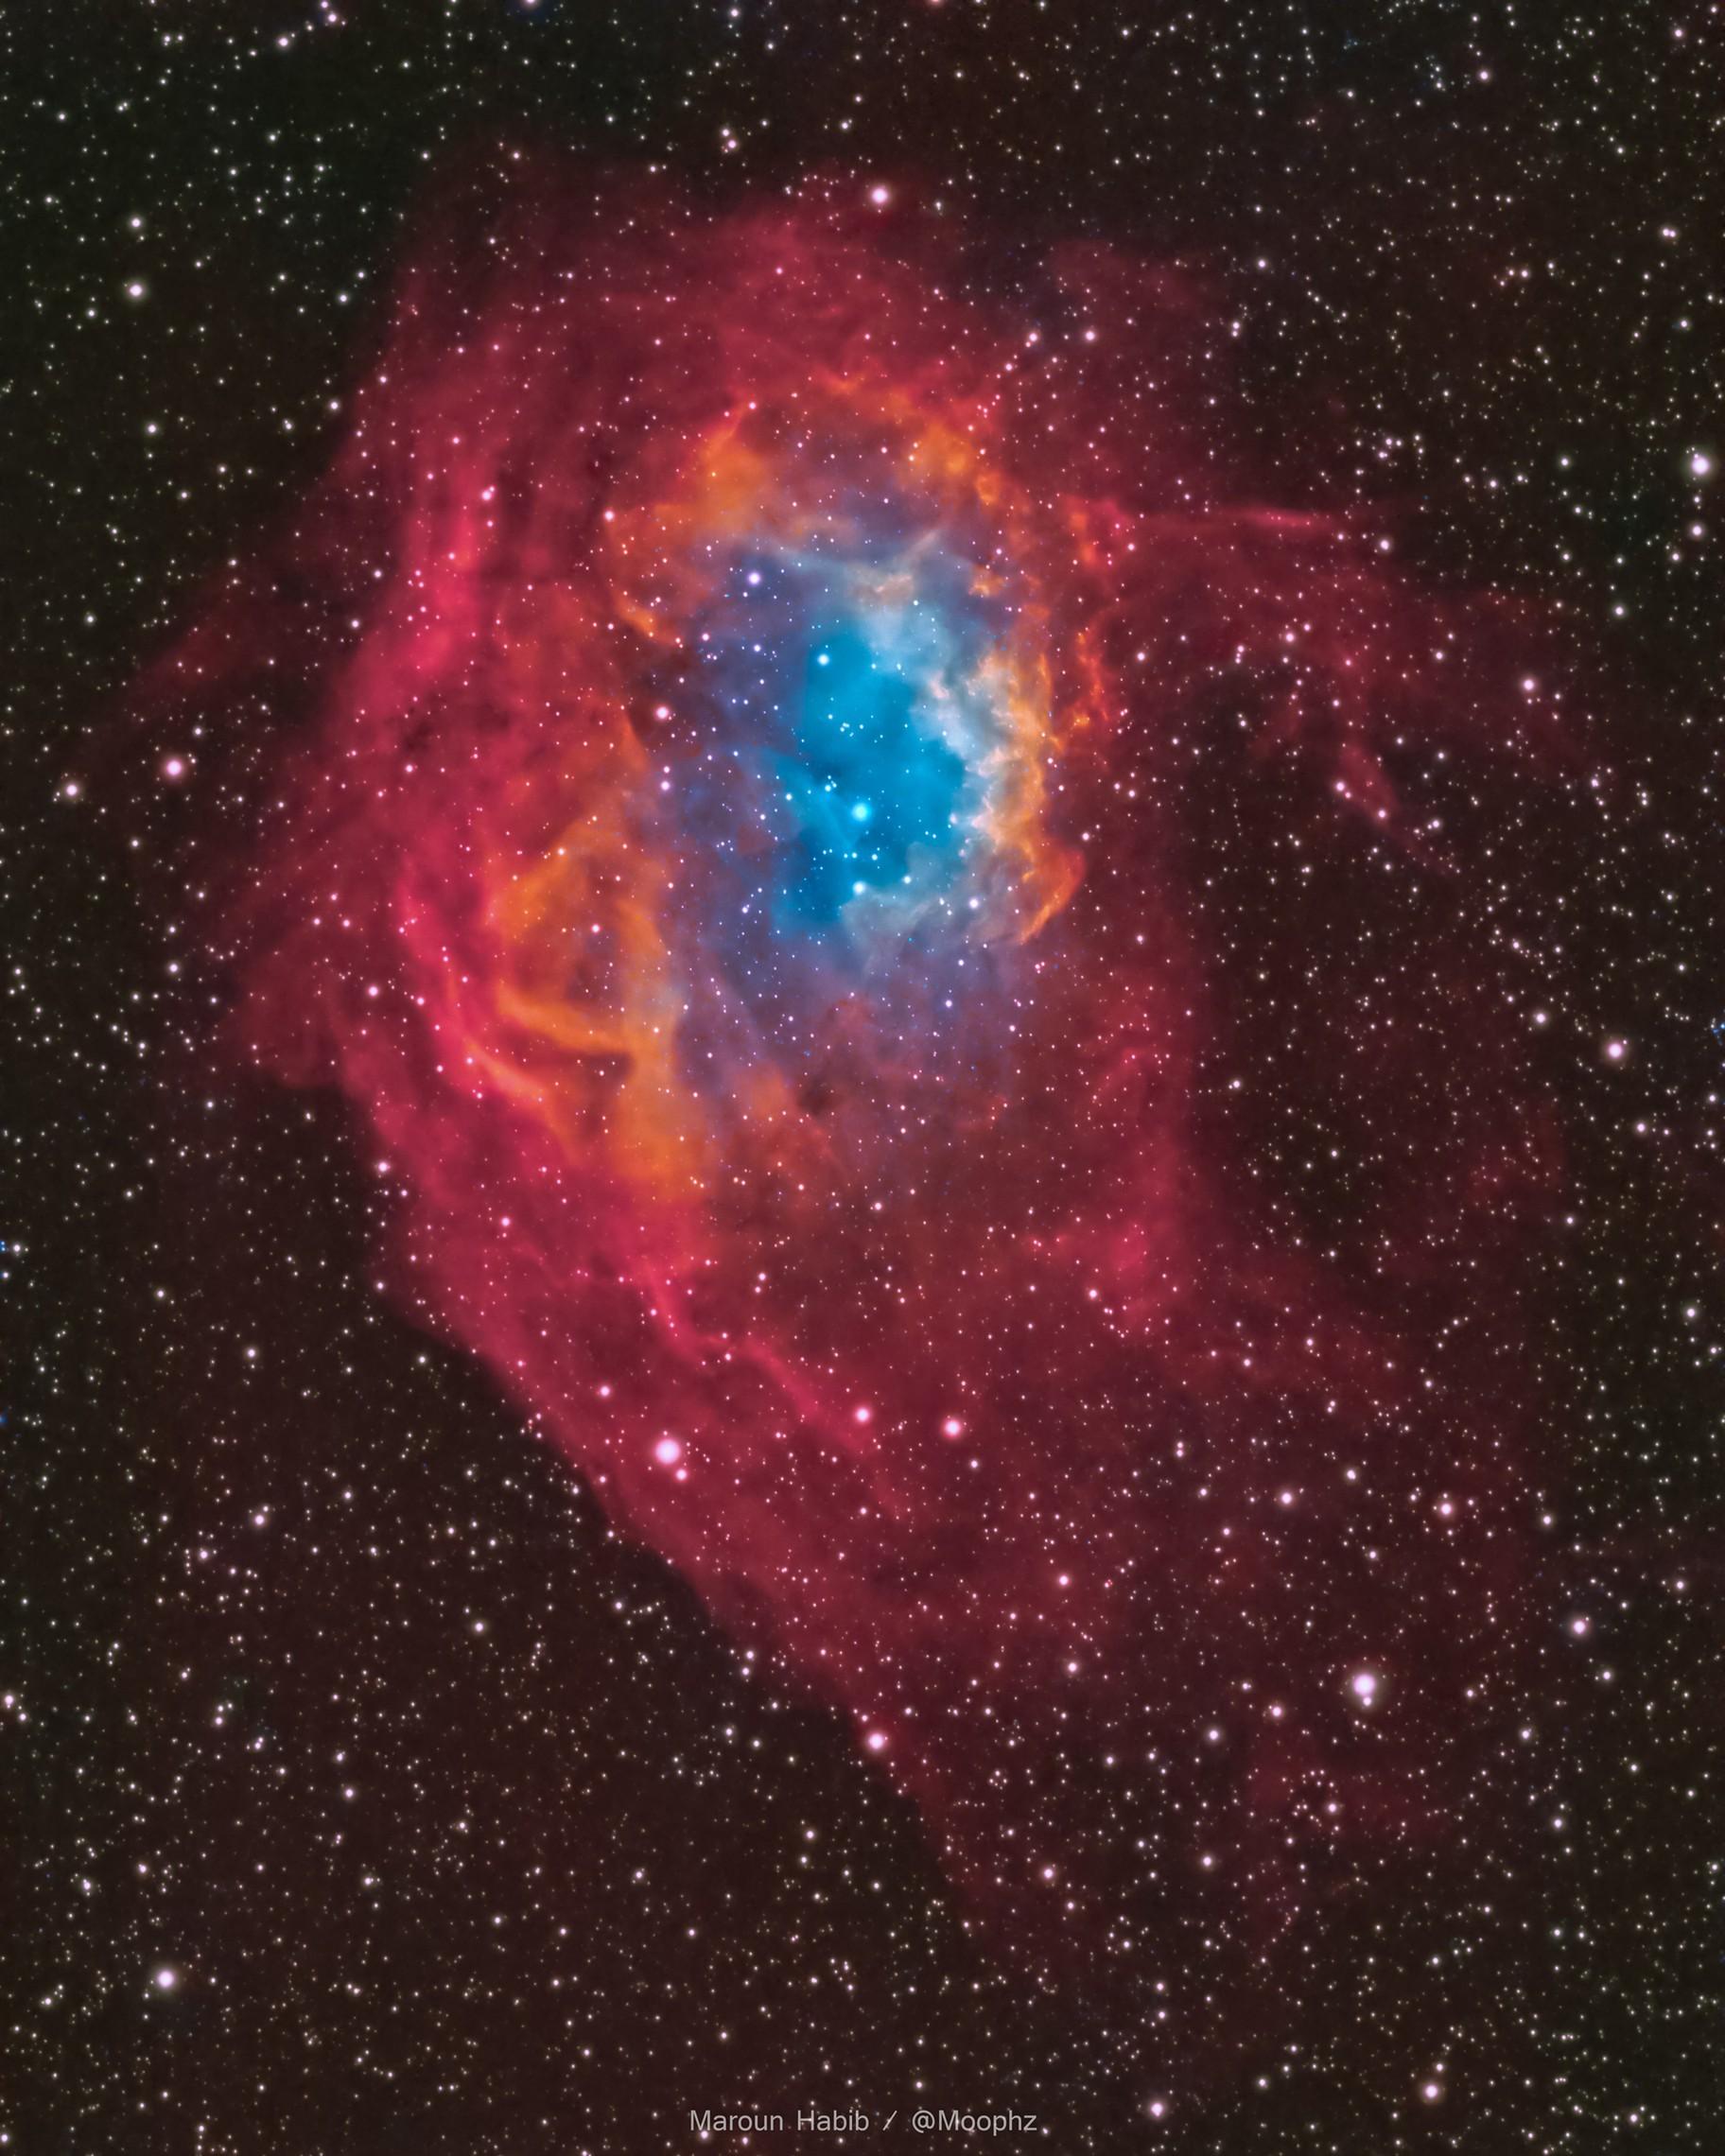 Lower's nebula / LBN 863 / Sh2-261